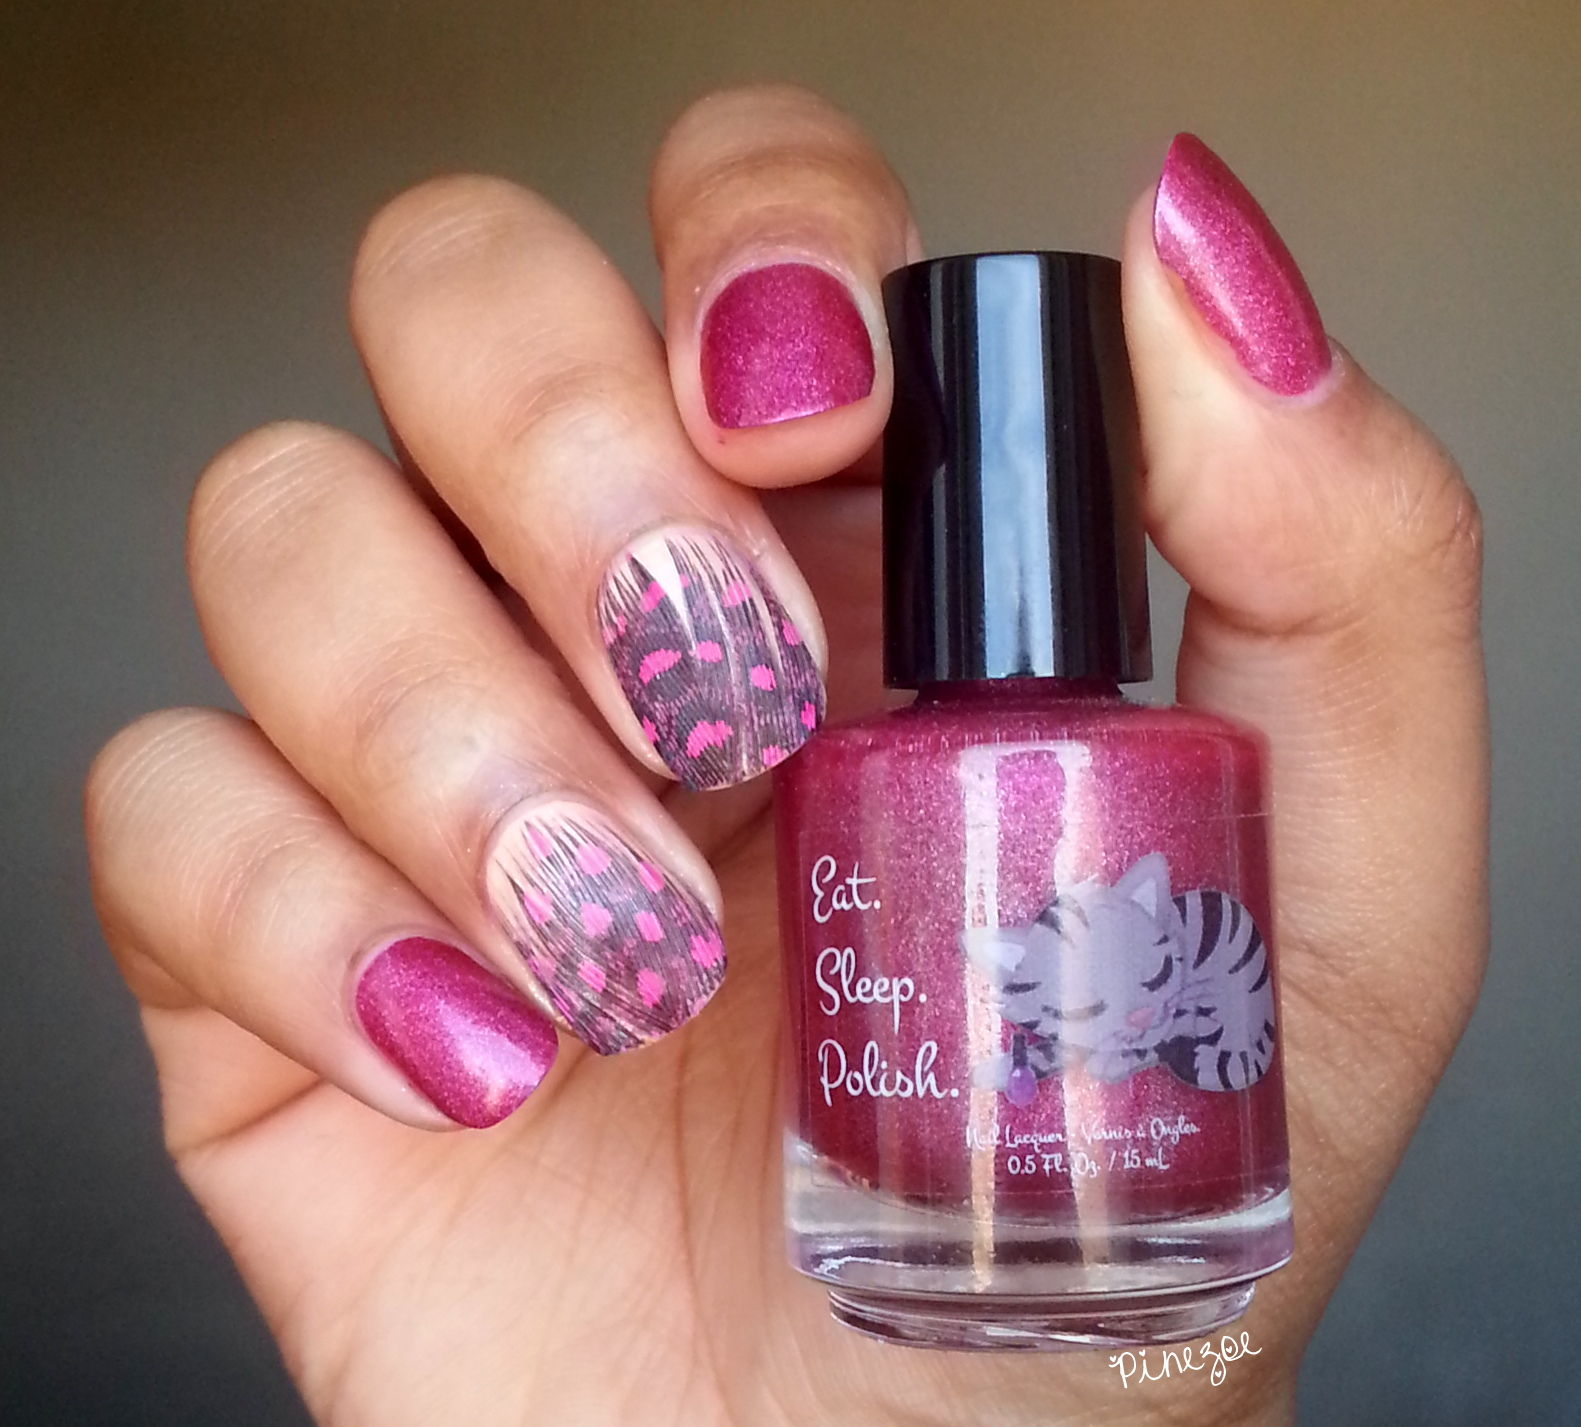 Eat Sleep Polish - Glitter berry & Ciaté Feather Manicure Kit